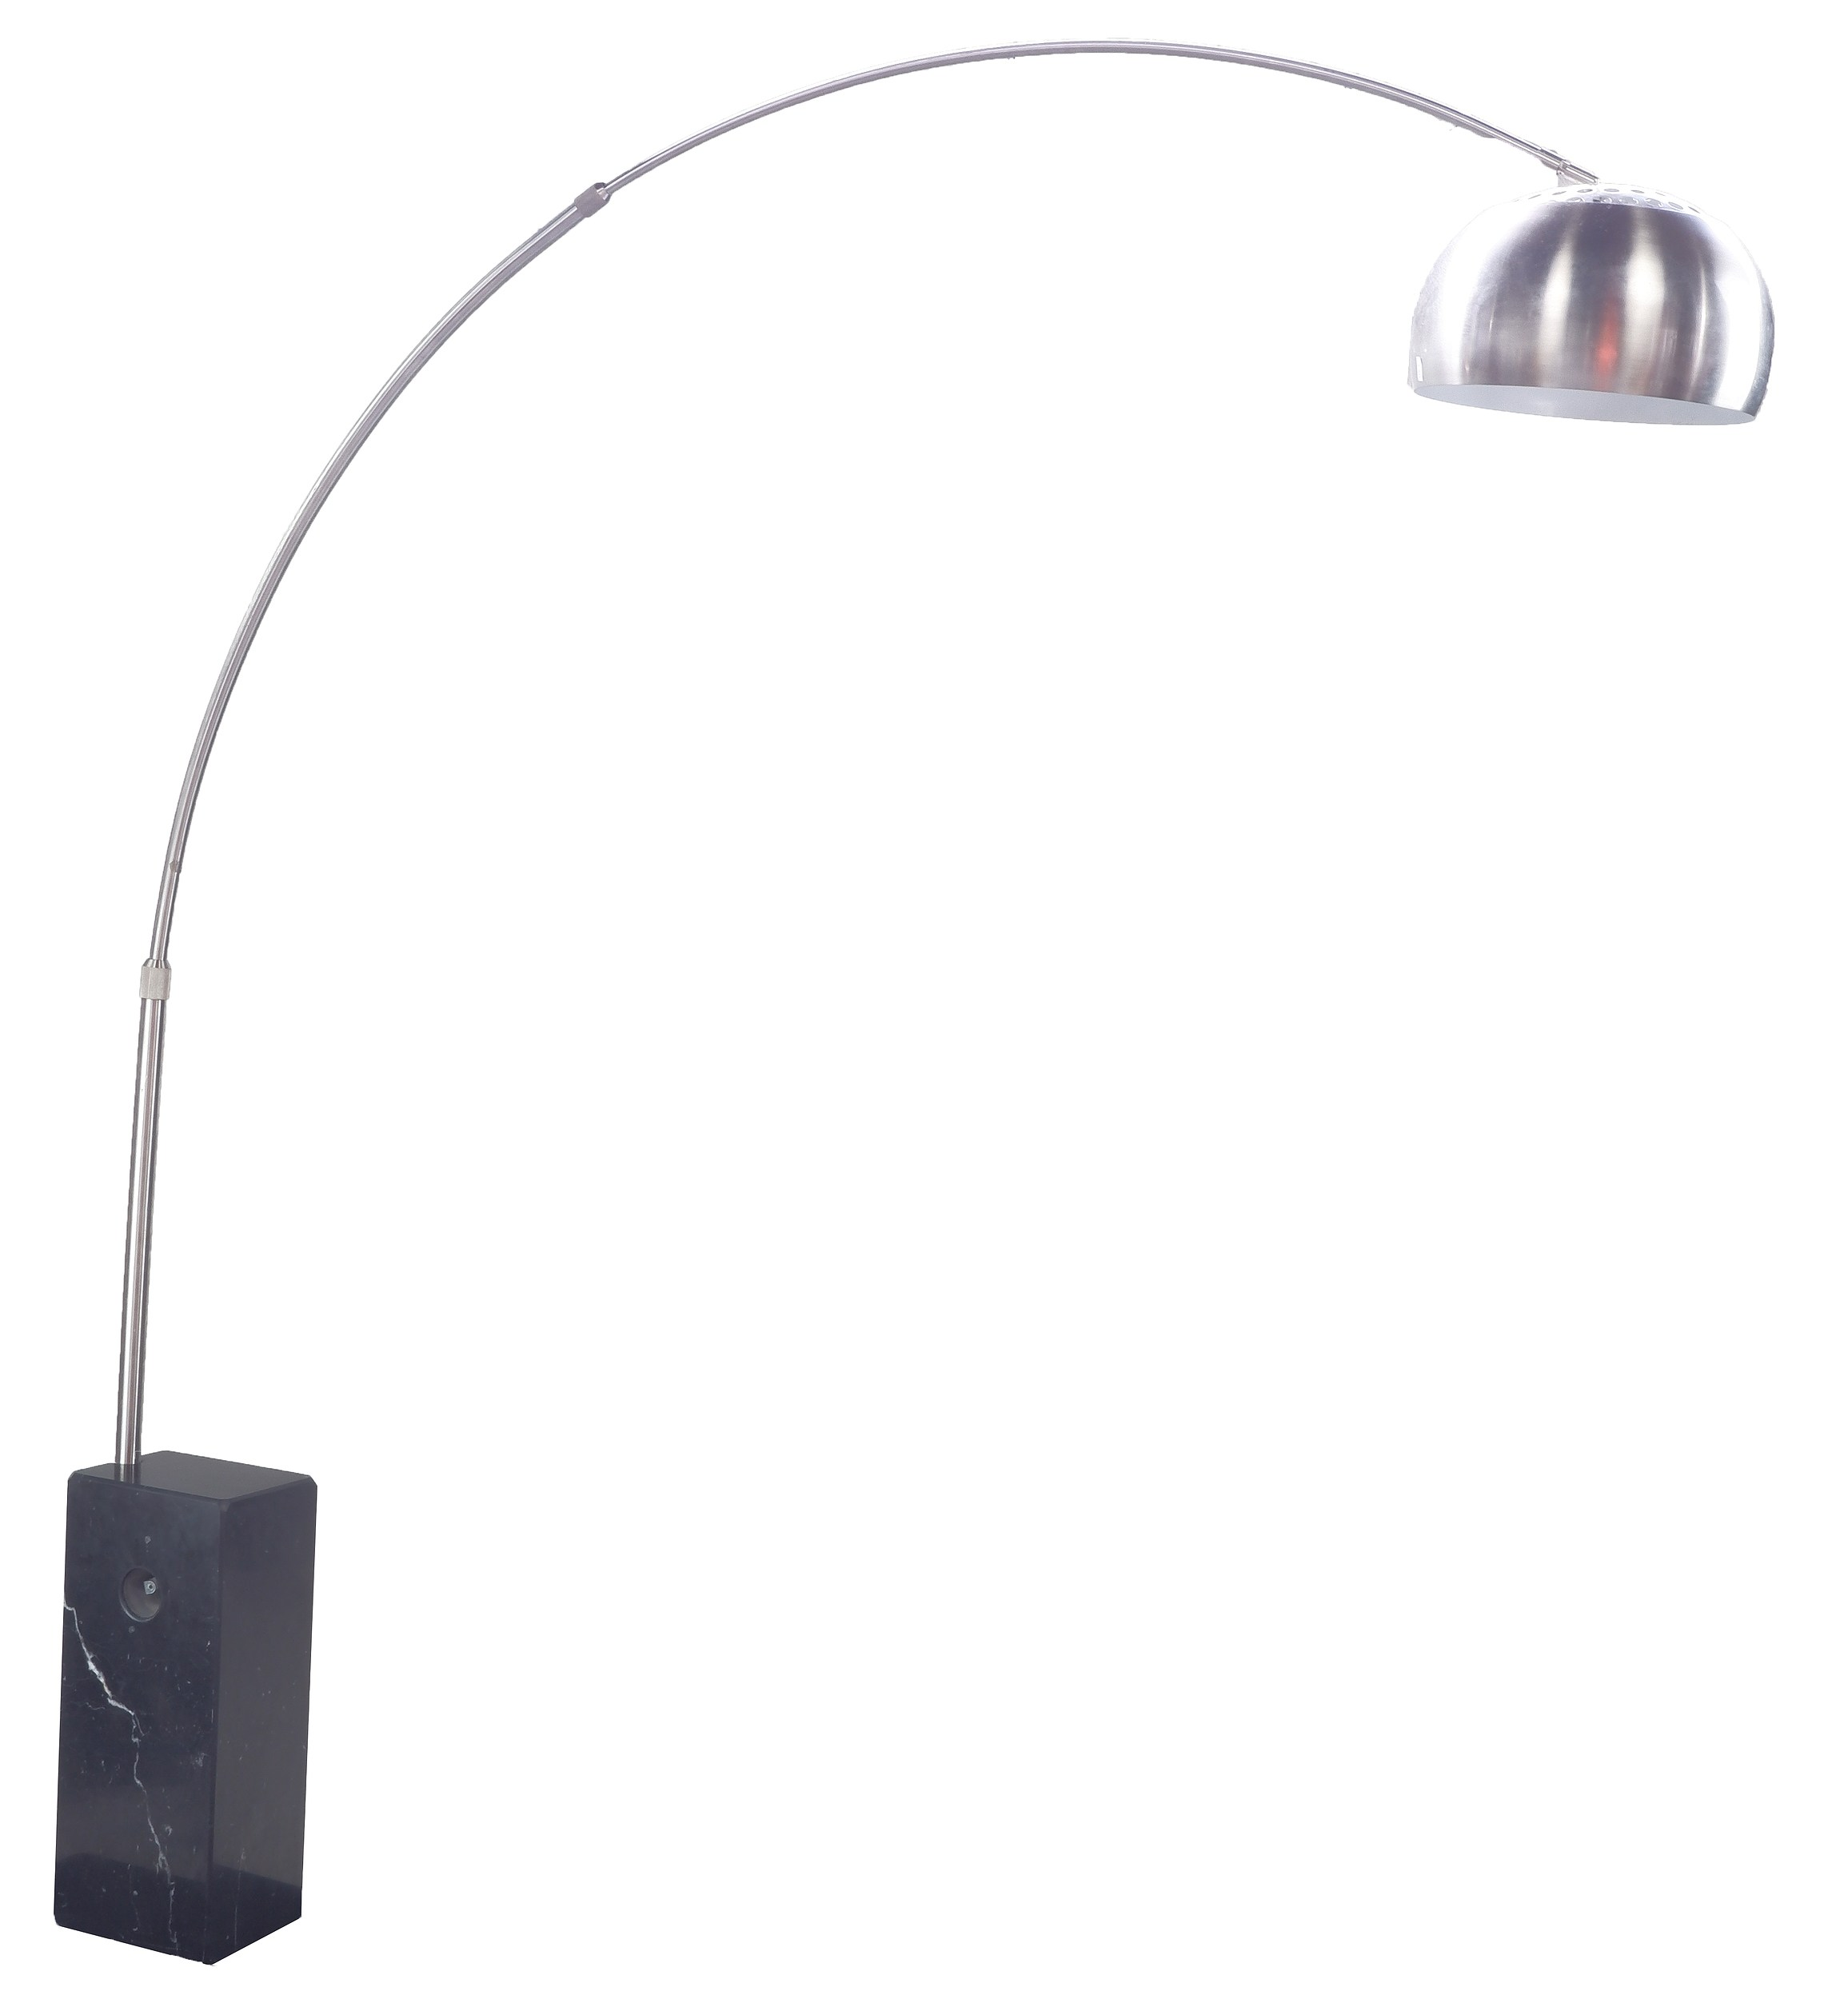 'Castiglioni Style Adjustable ARCO Floor Lamp'